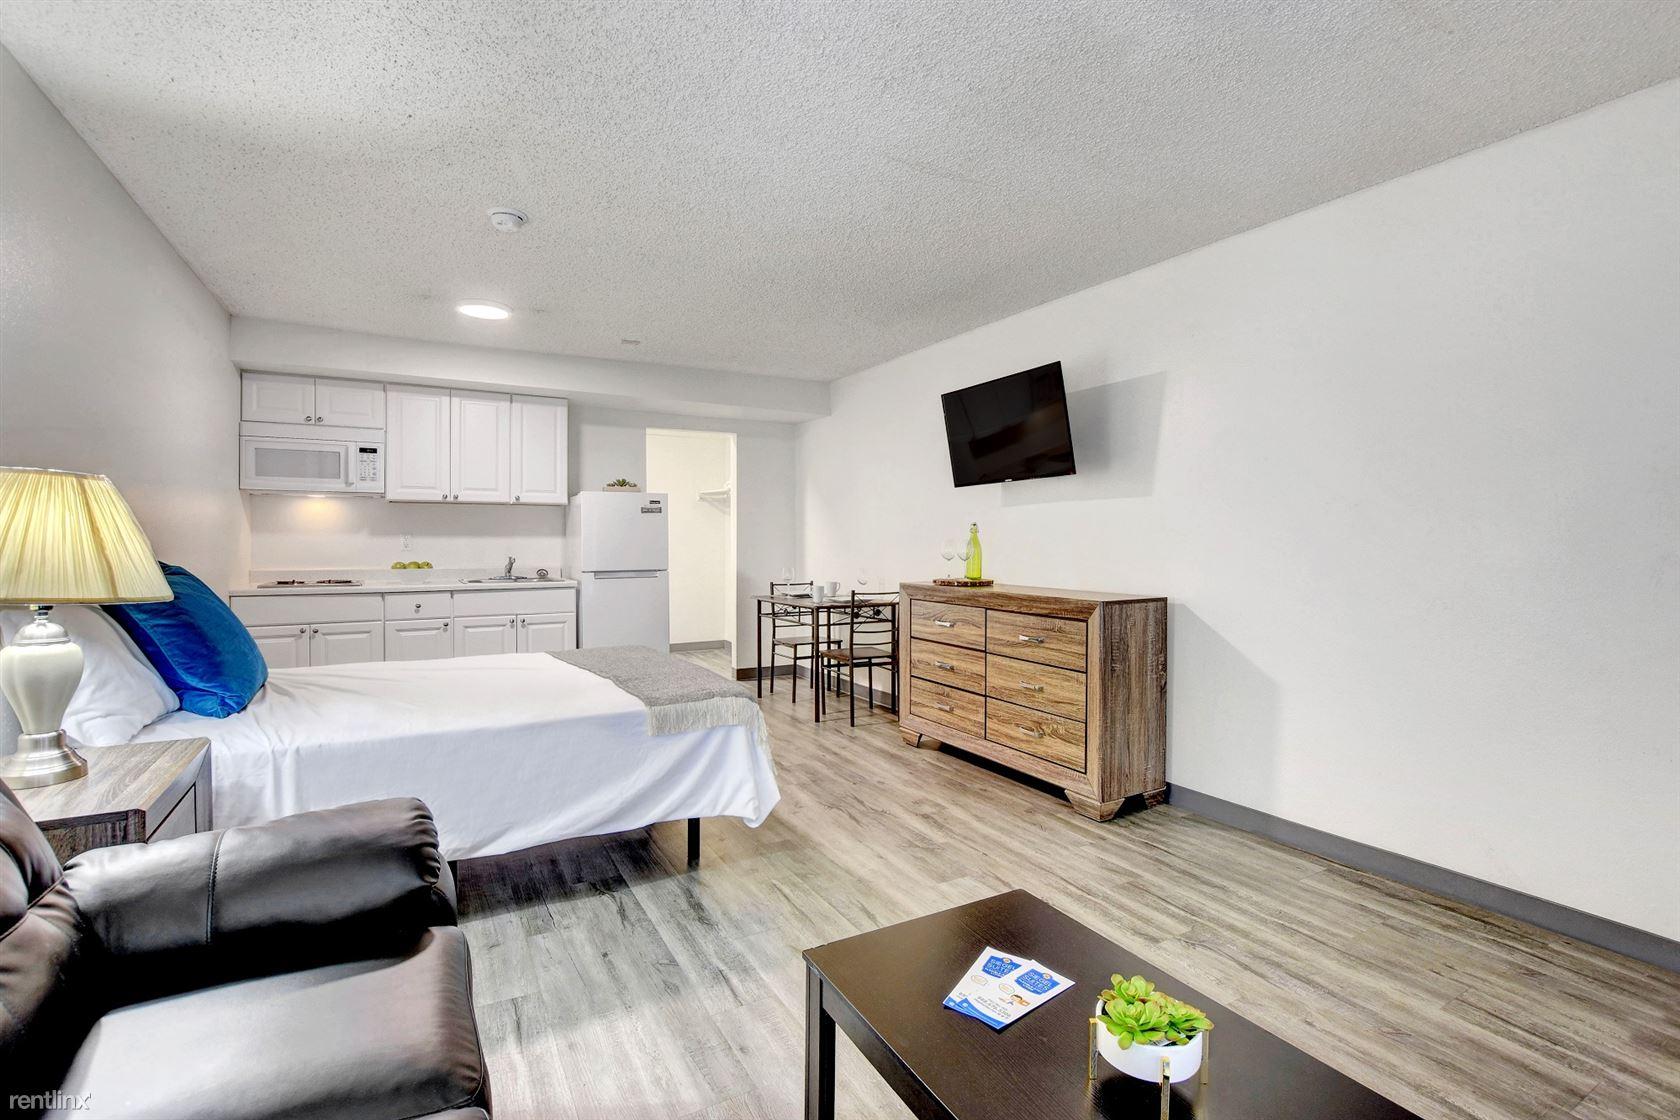 5011 E Craig Rd, Las Vegas, NV - 1,092 USD/ month